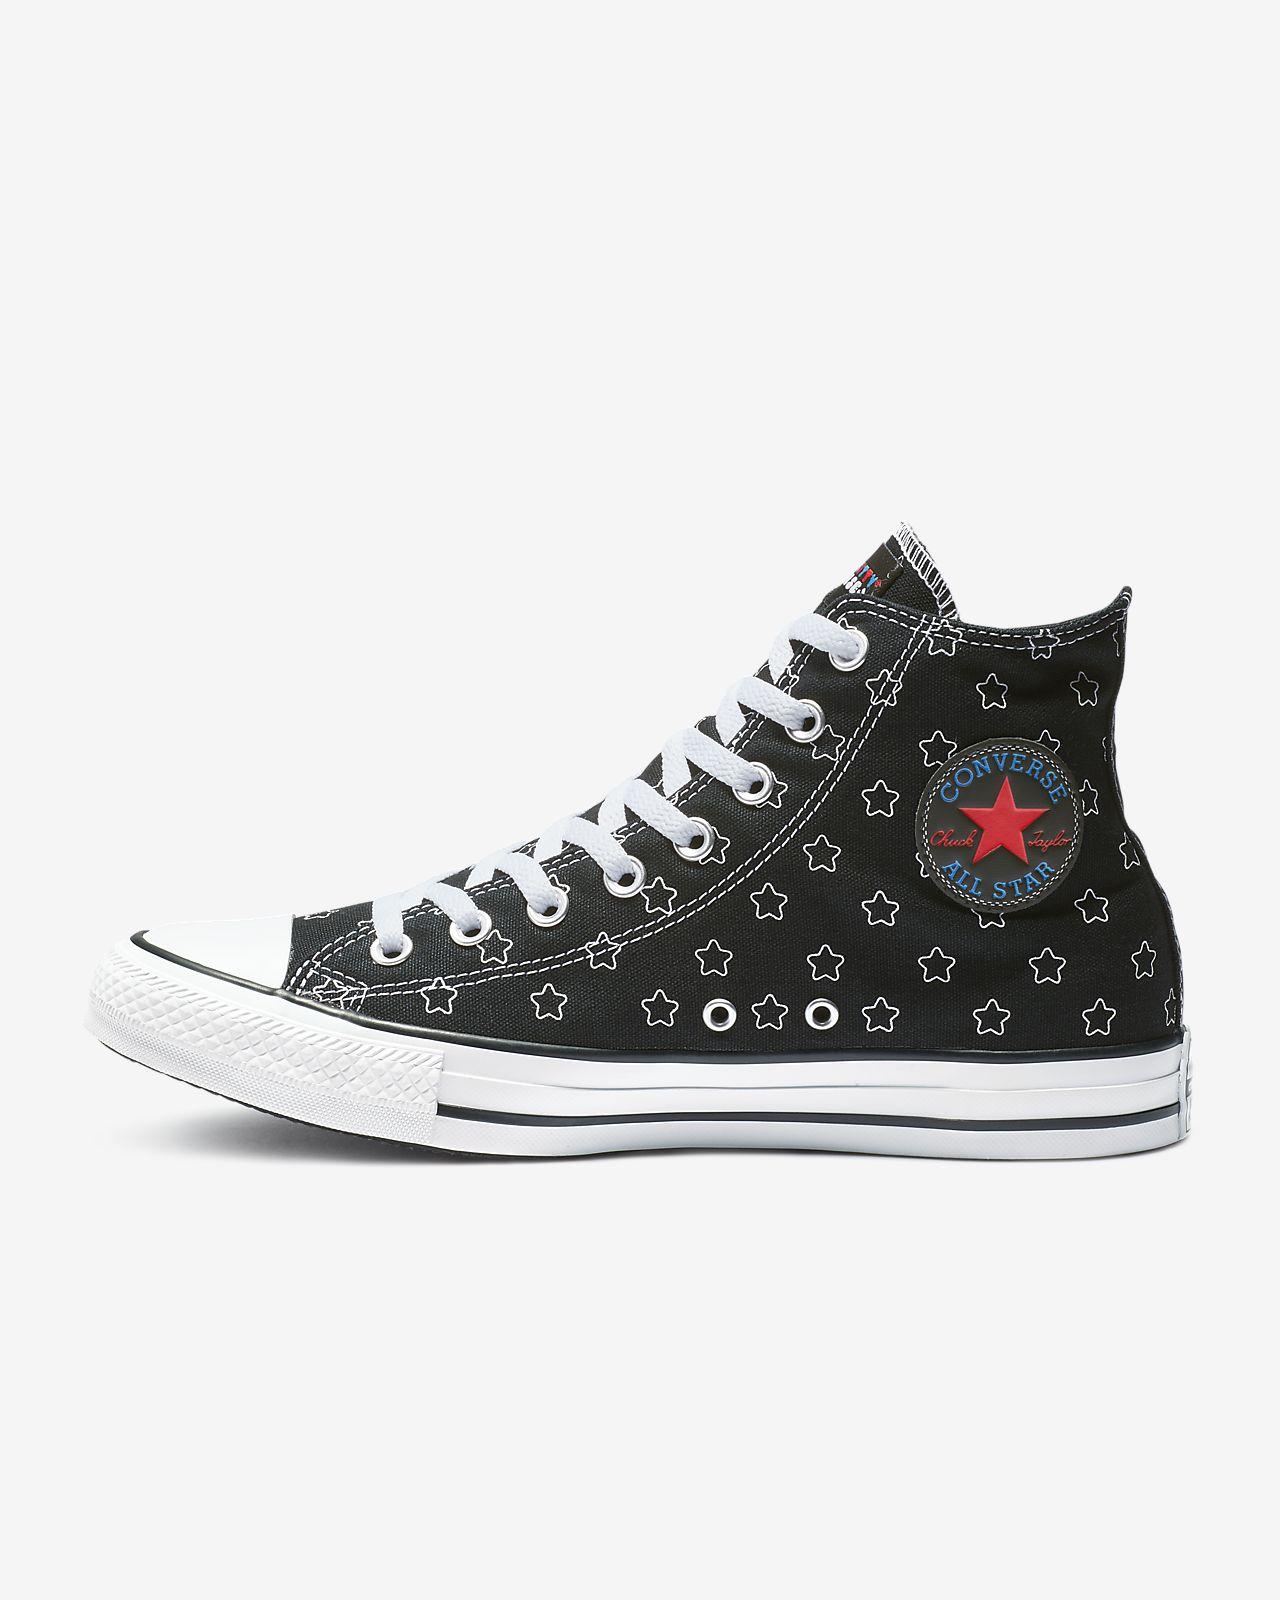 Converse x Hello Kitty Chuck Taylor All Star High Top  Unisex Shoe